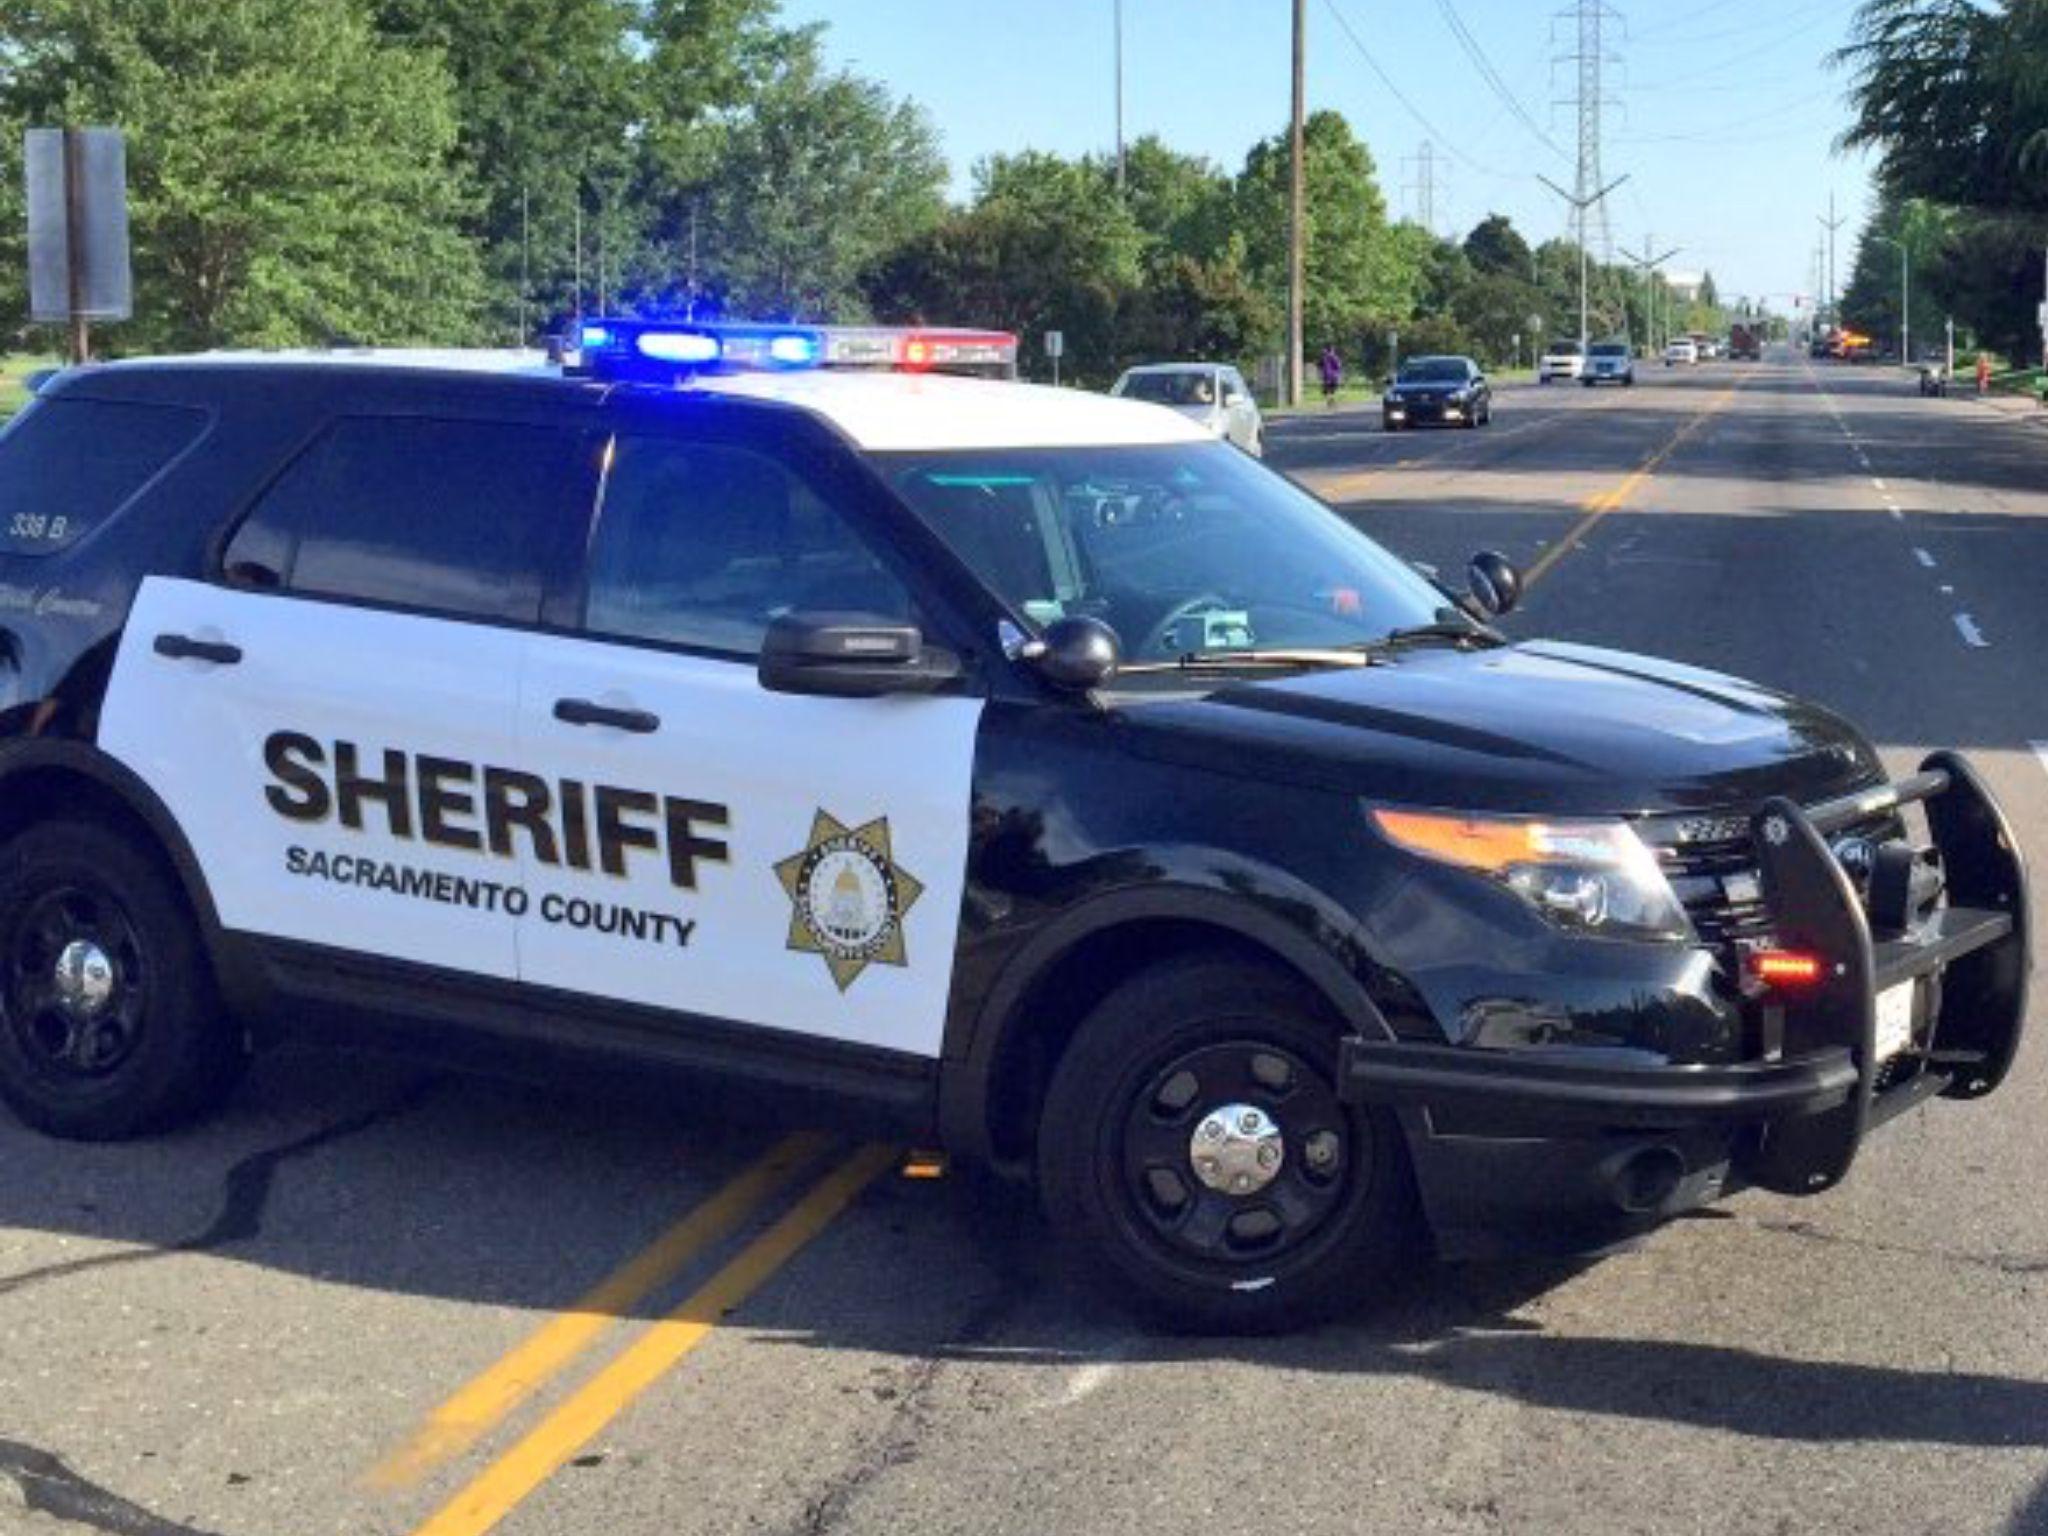 Sacramento Sheriff Ford Explorer Police Cars Emergency Vehicles Emergency Service